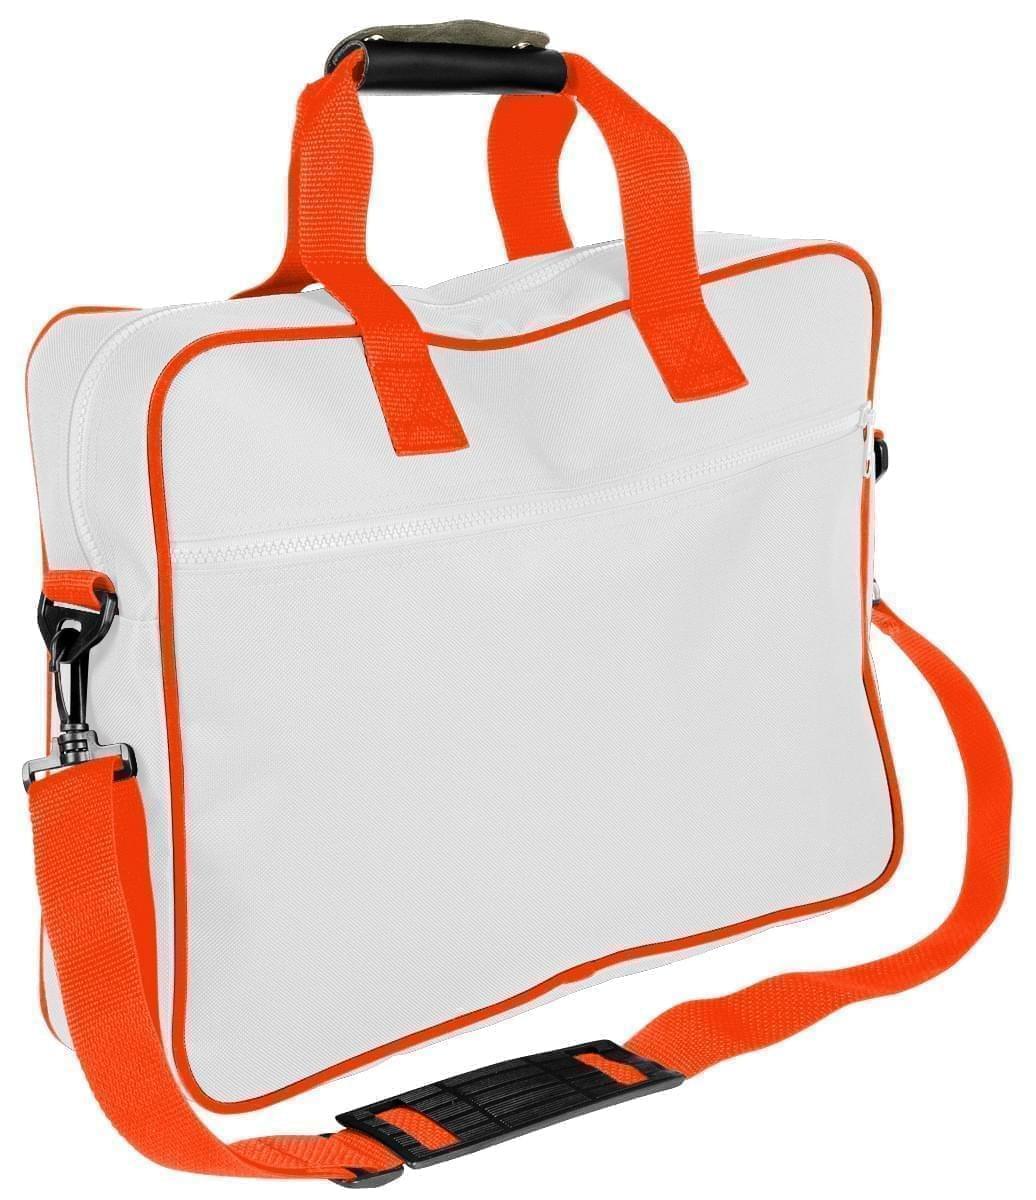 USA Made Nylon Poly Notebook Sleeves, White-Orange, CPKVA59P30